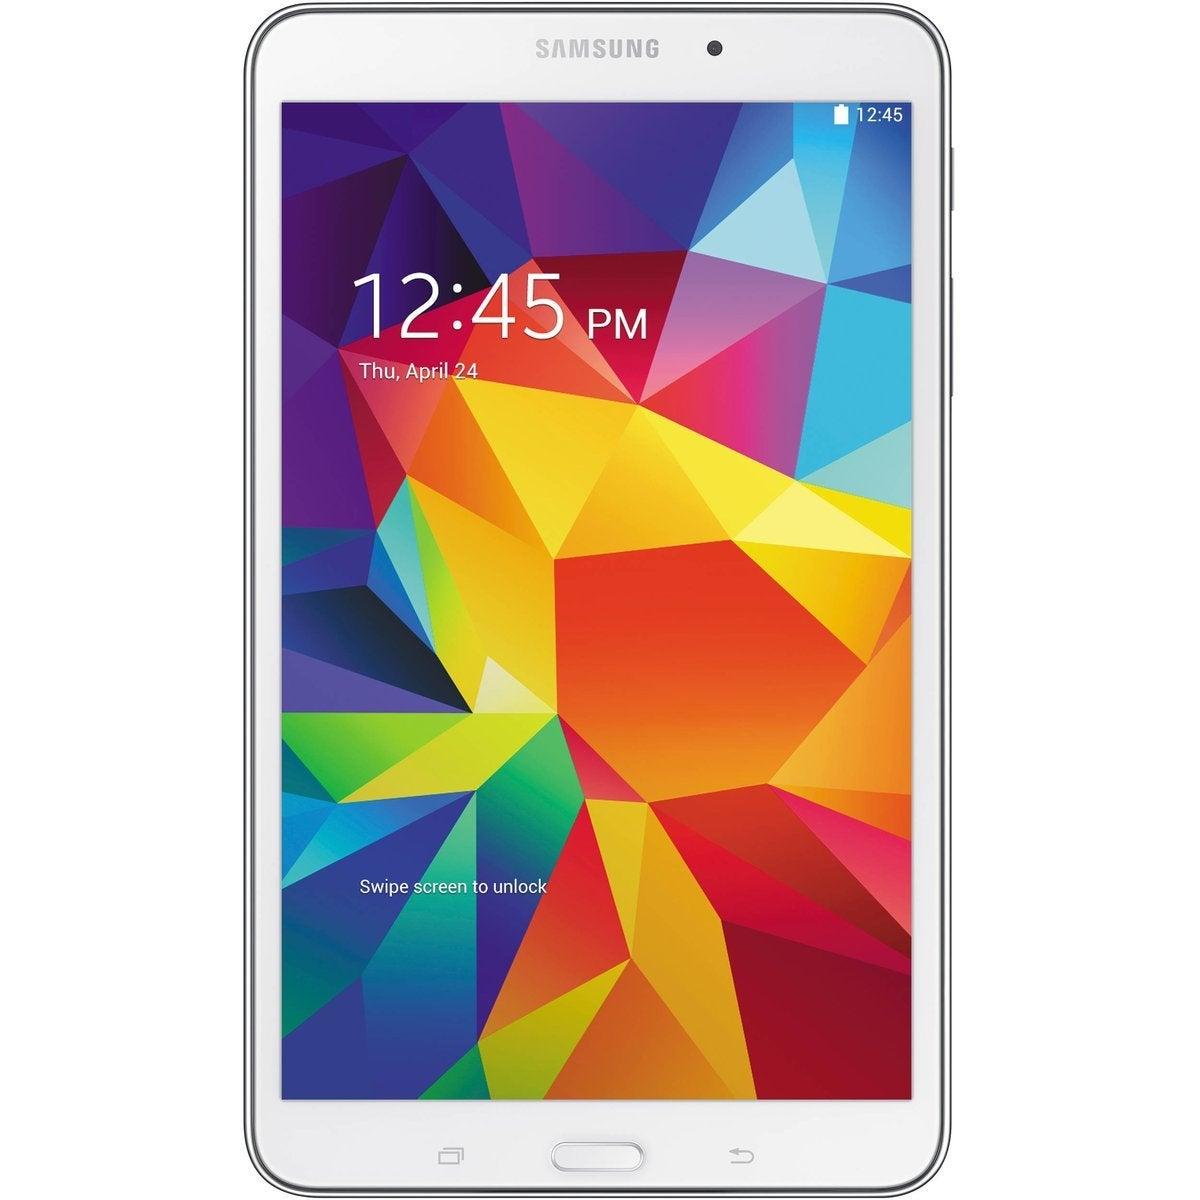 Samsung Galaxy Tab 4 8.0 16GB WiFi Tablet